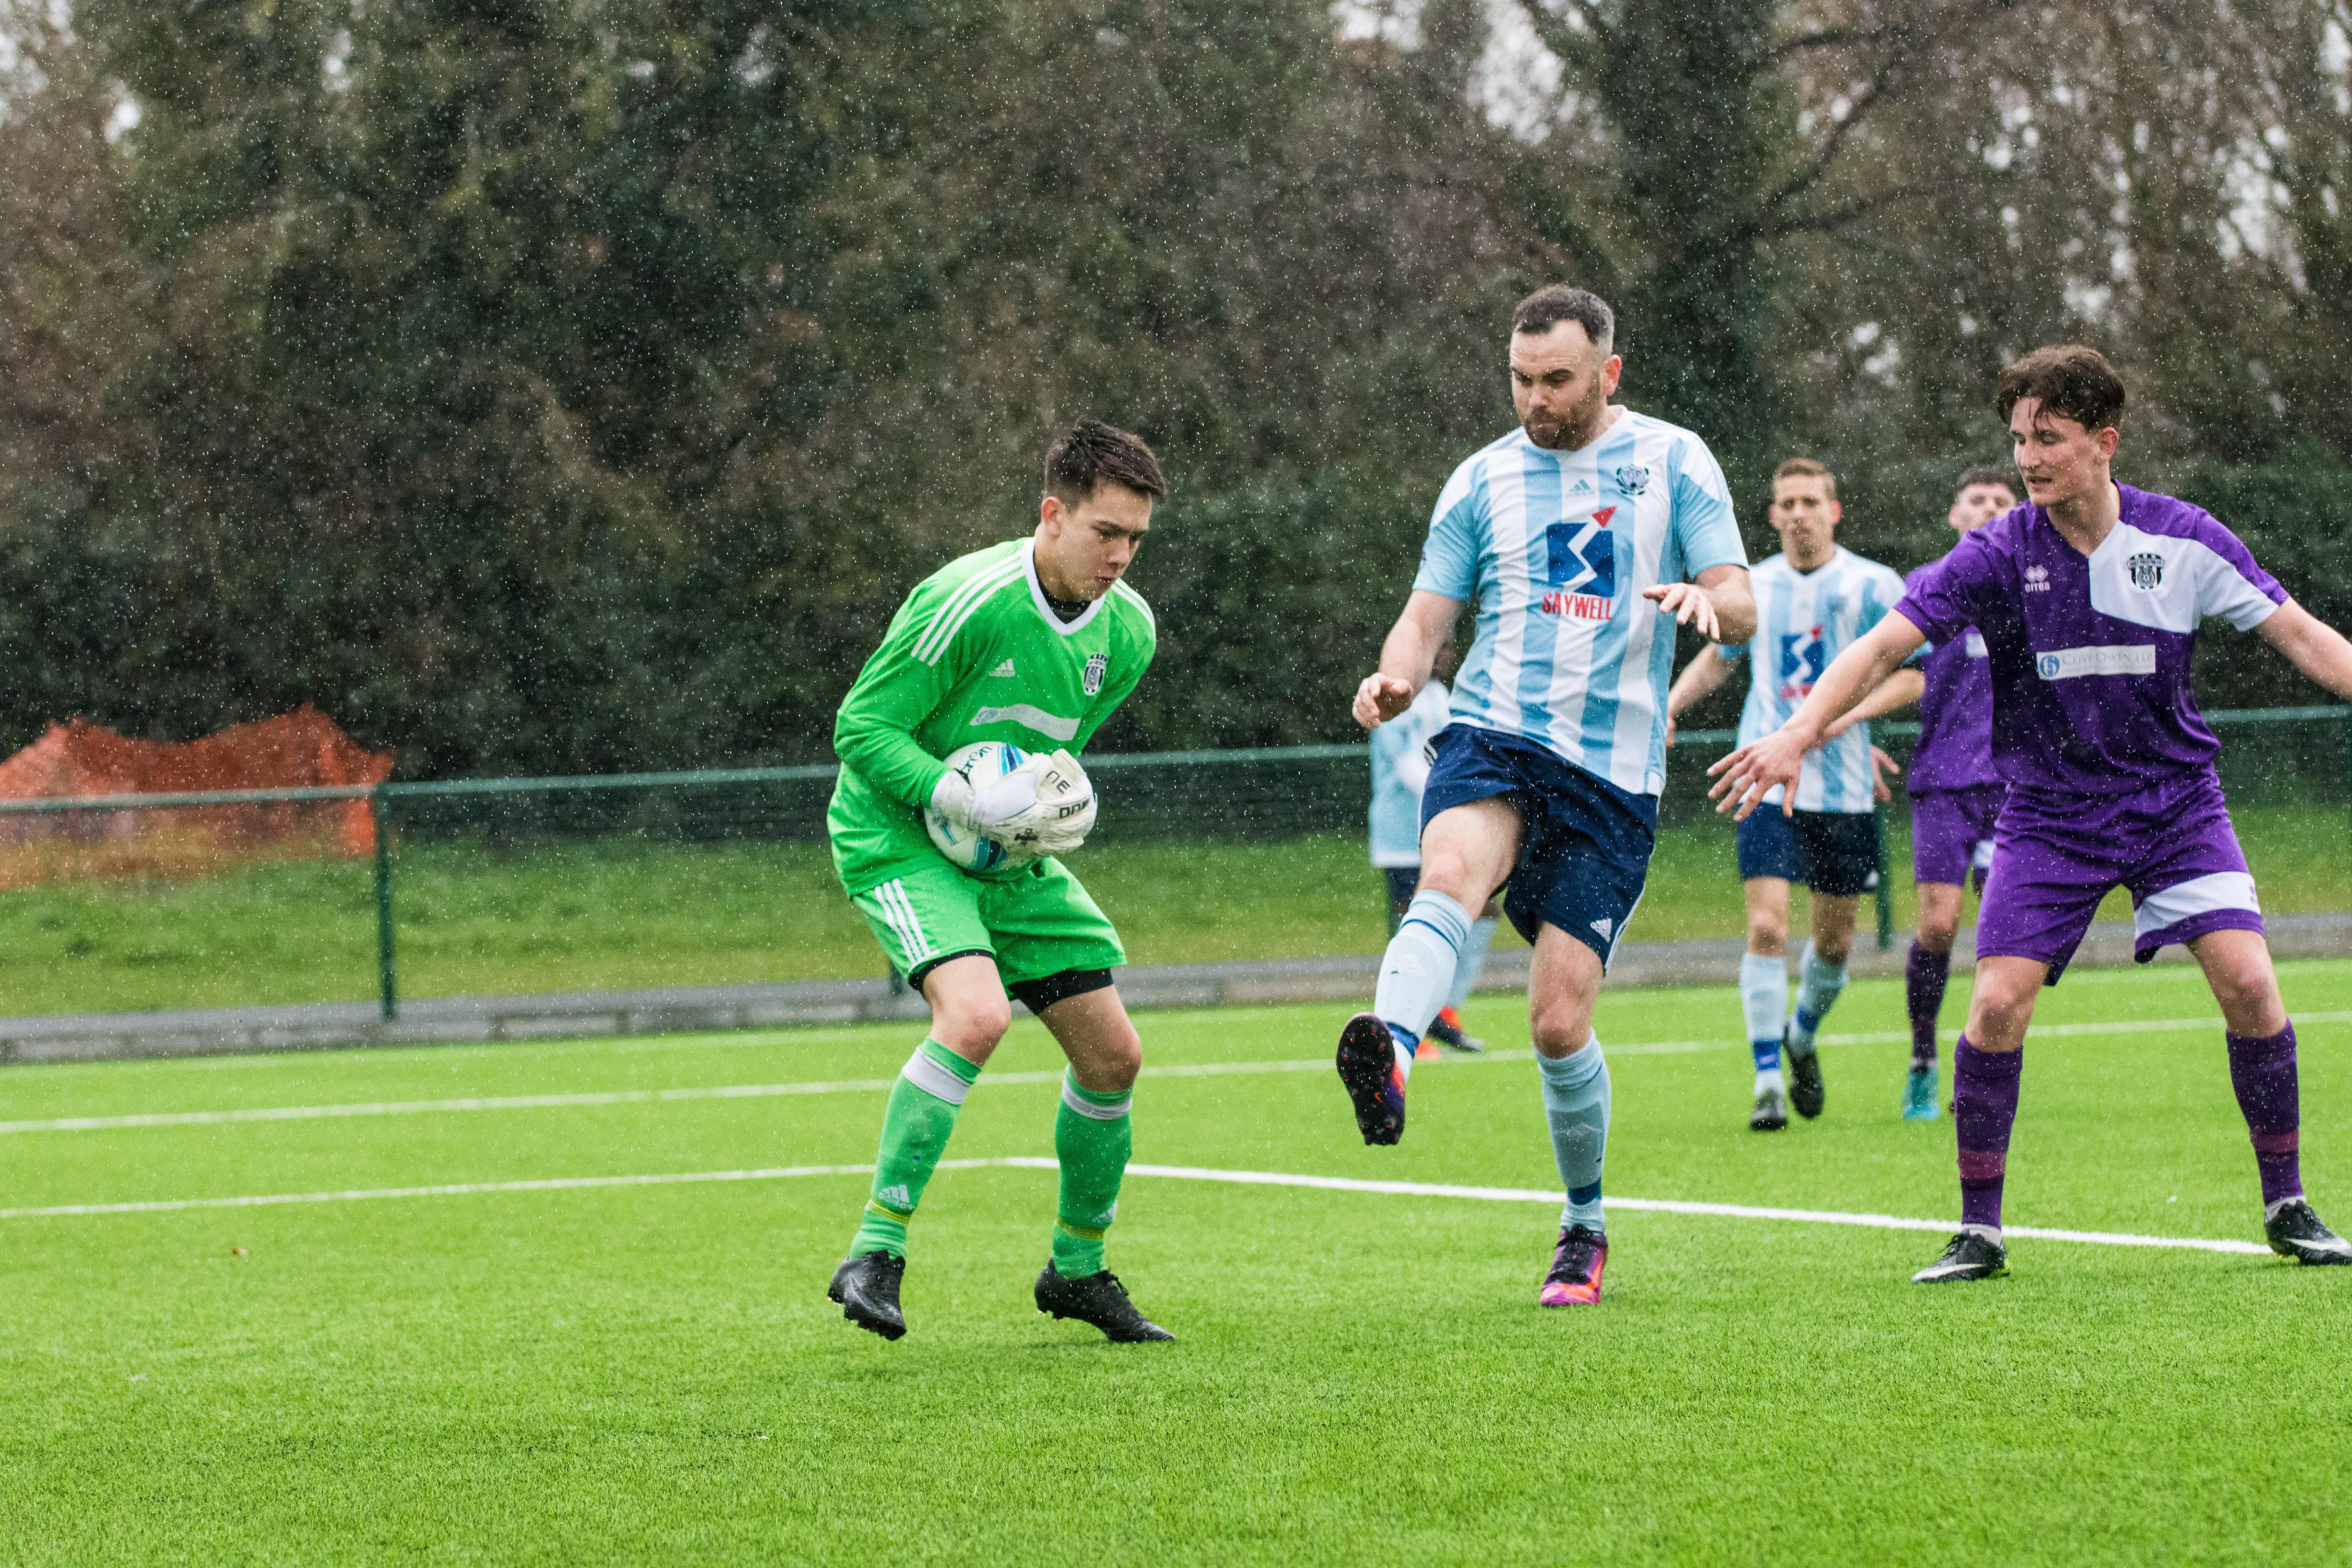 DAVID_JEFFERY Worthing United FC vs East Preston FC 02.04.18 95